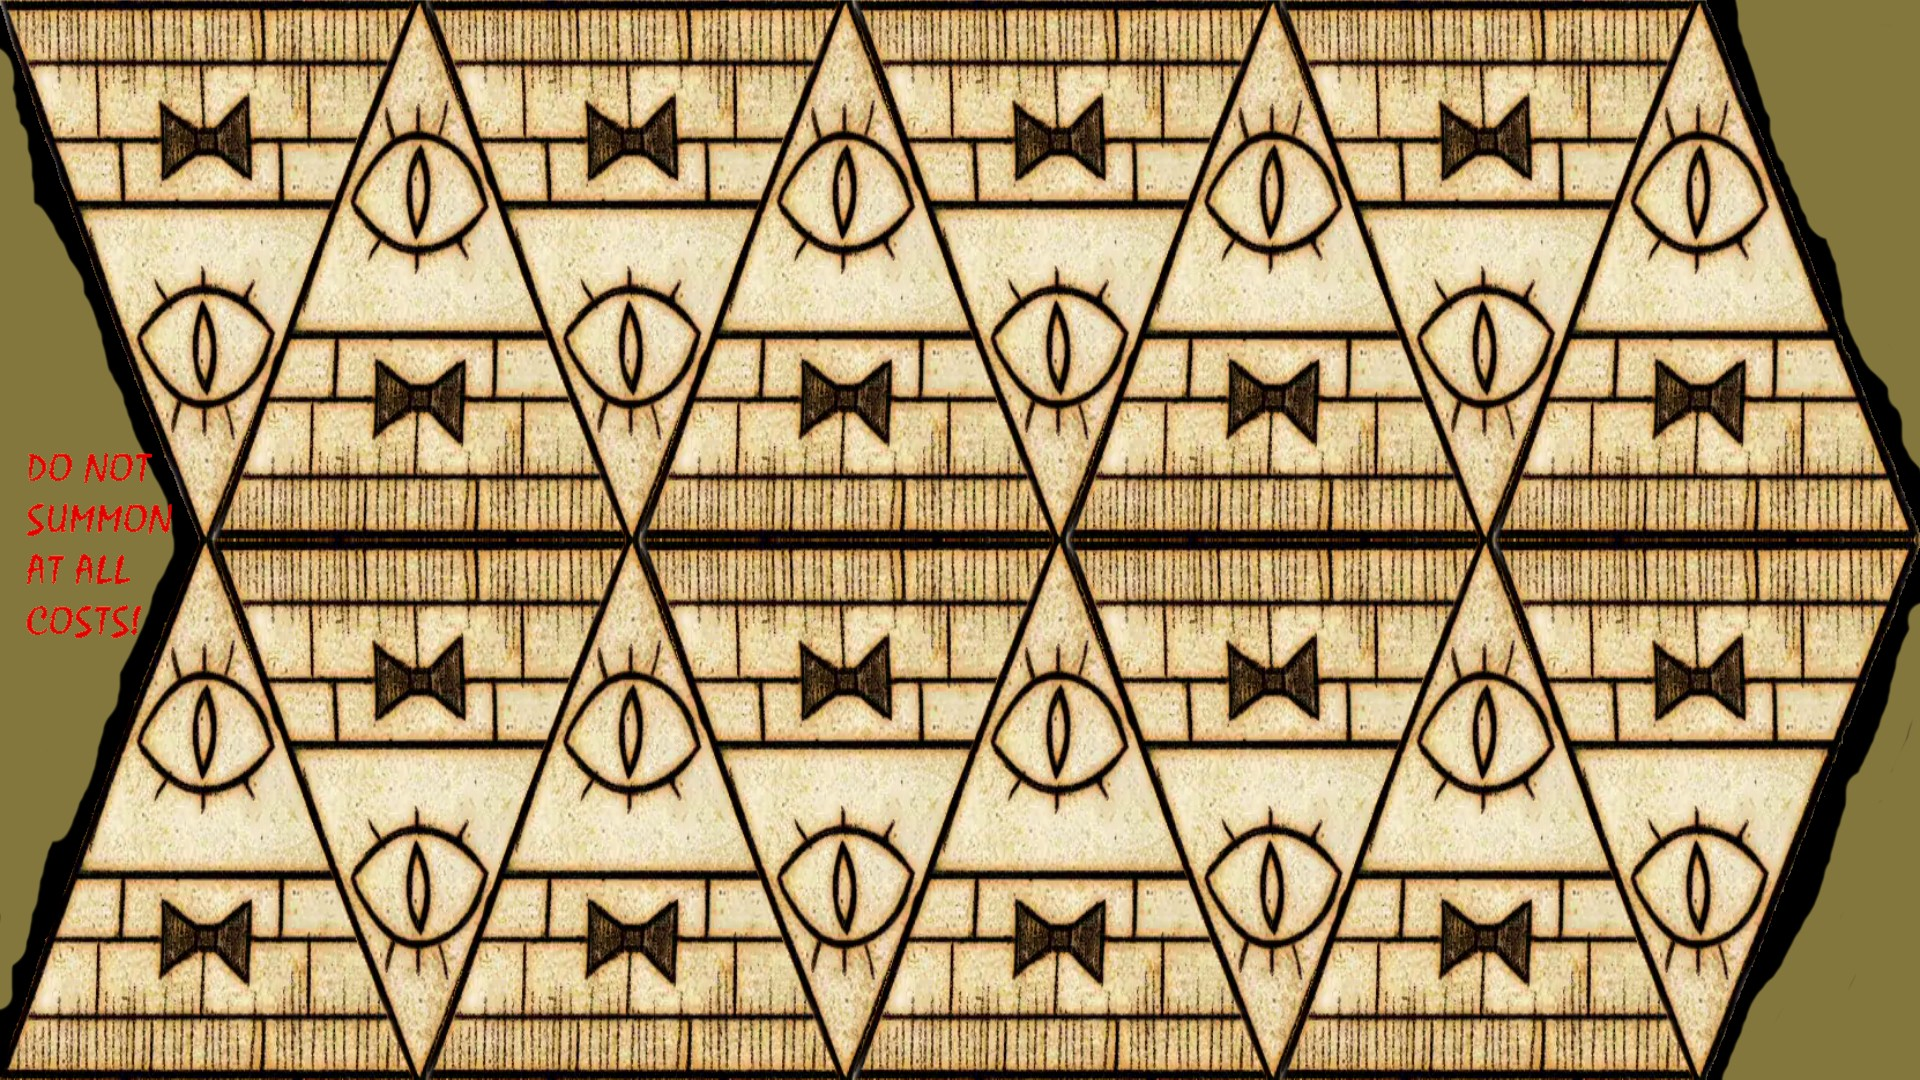 Gravity Falls Wallpaper Phone Hd Bill Cipher Wallpaper 183 ① Download Free Awesome Full Hd